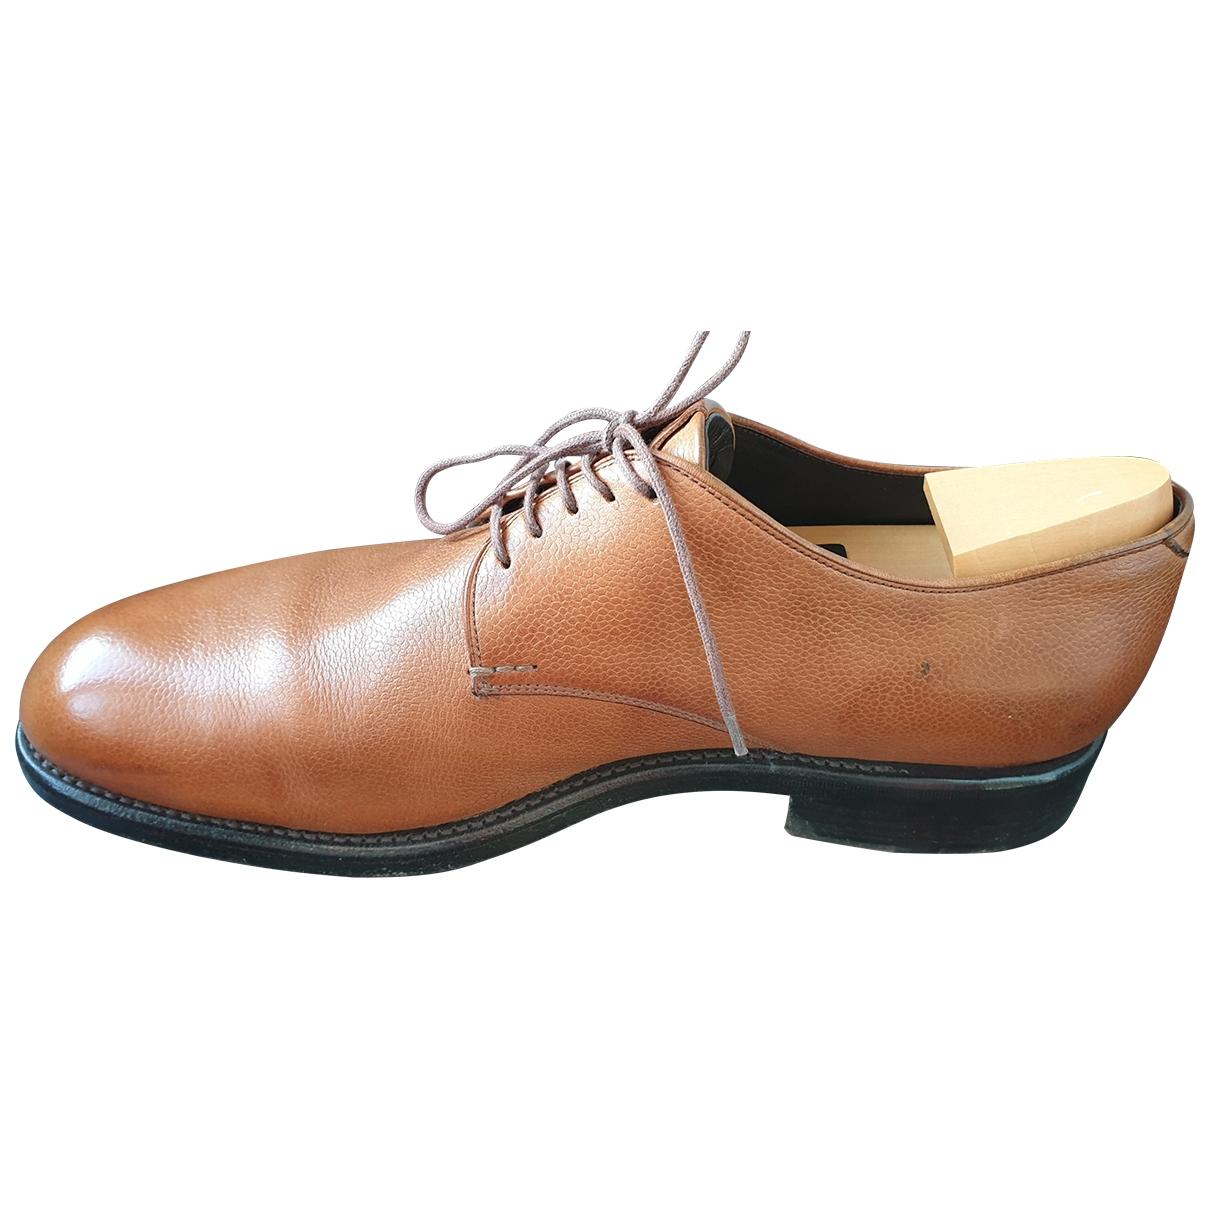 Heschung - Derbies   pour homme en cuir - marron